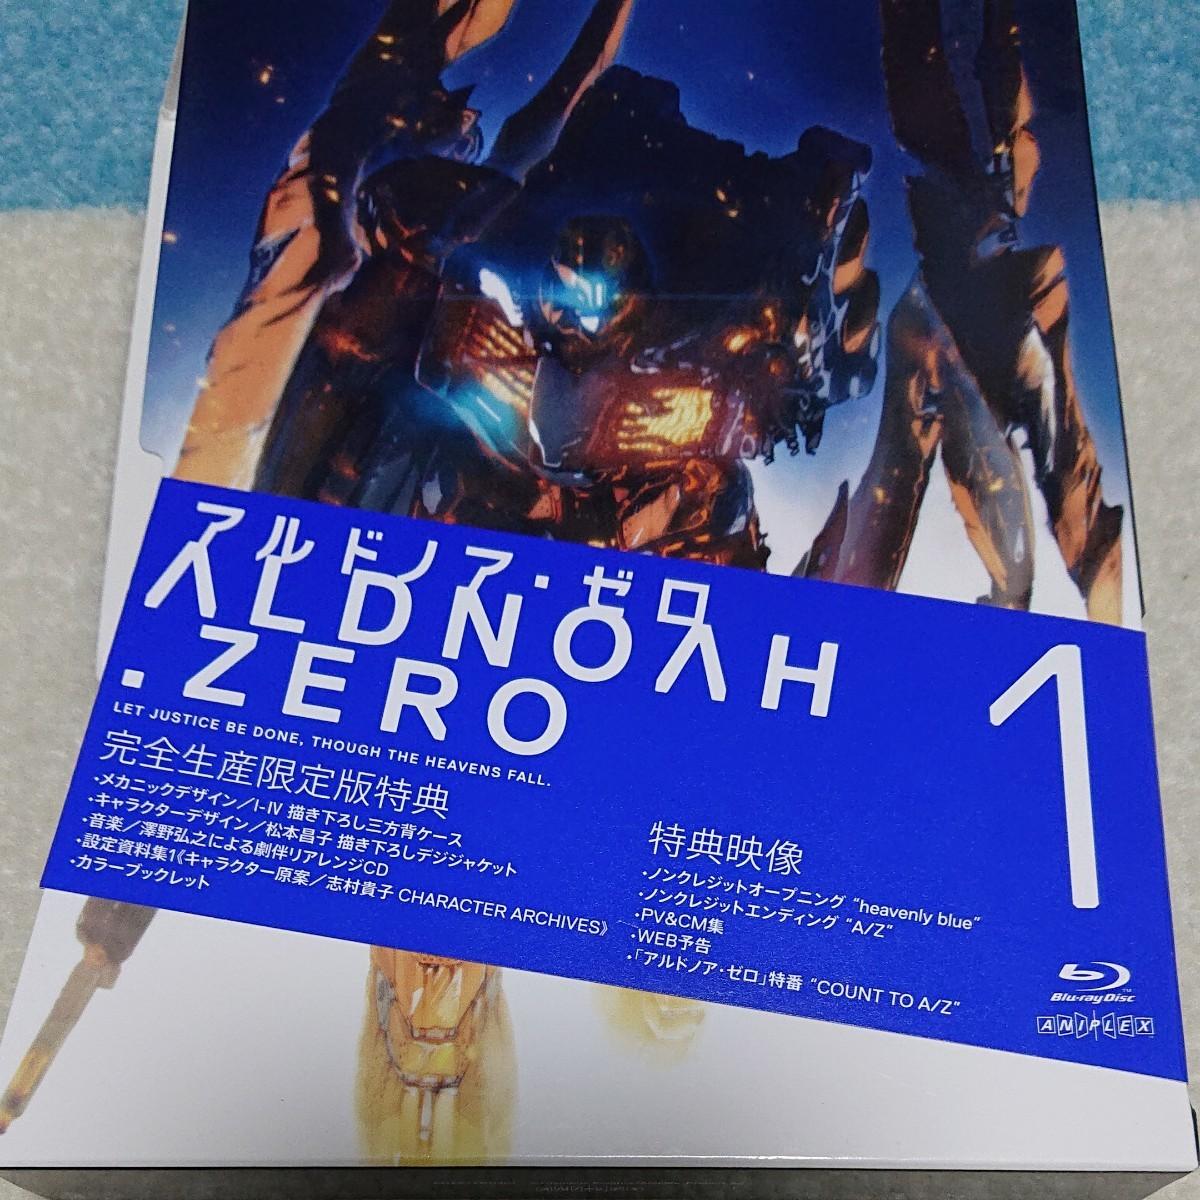 ■Blu-ray■ アルドノア・ゼロ 1 ALDONOAH.ZERO